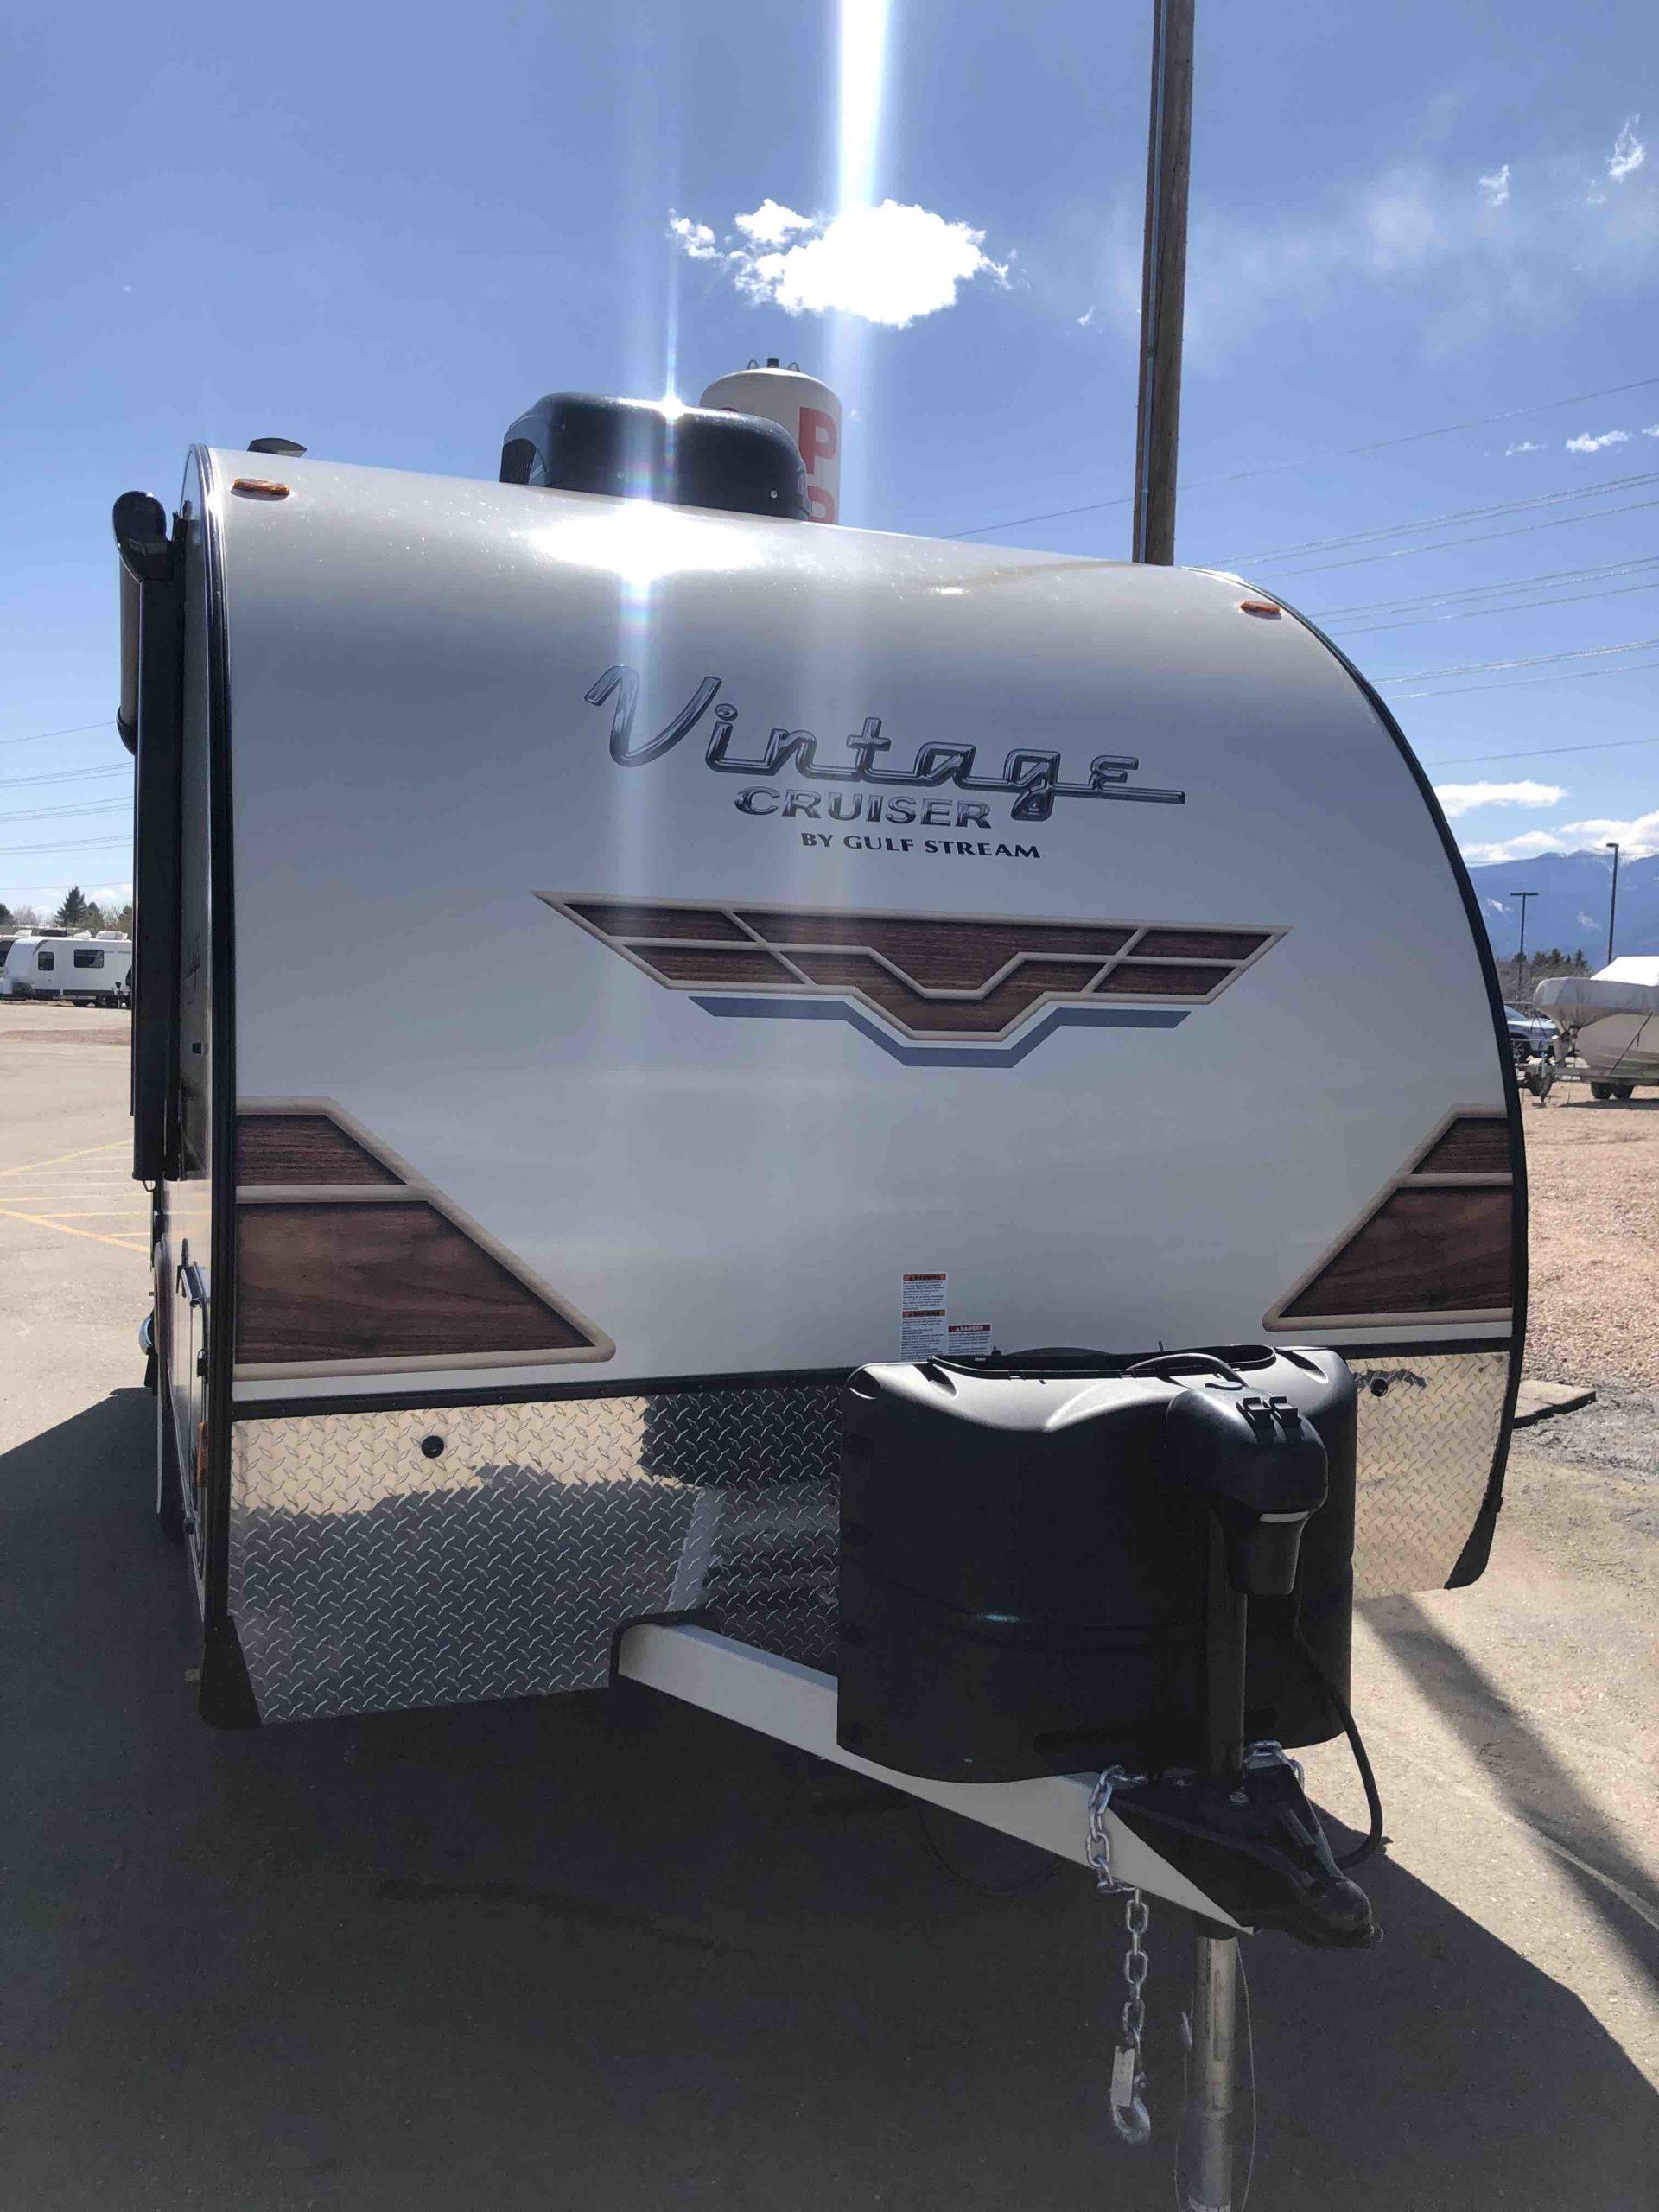 2021 Gulf Stream Vintage Cruiser 17scd For Sale In Colorado Springs Pikes Peak Rv